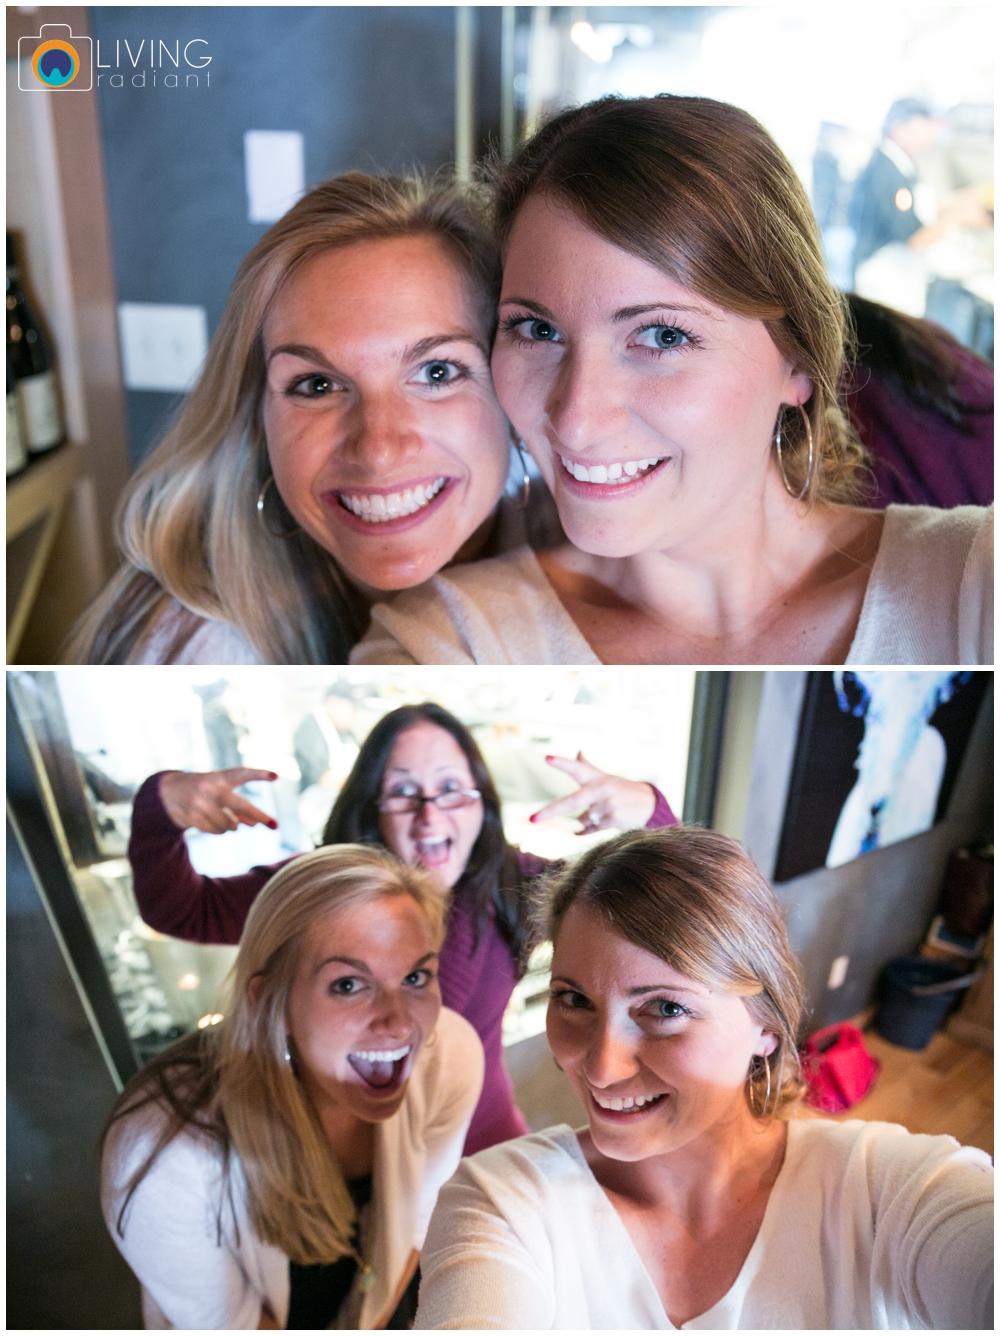 krissys-bridesmaid-luncheon-the-blue-goat-richmond-virginia-living-radiant-photography_0006.jpg